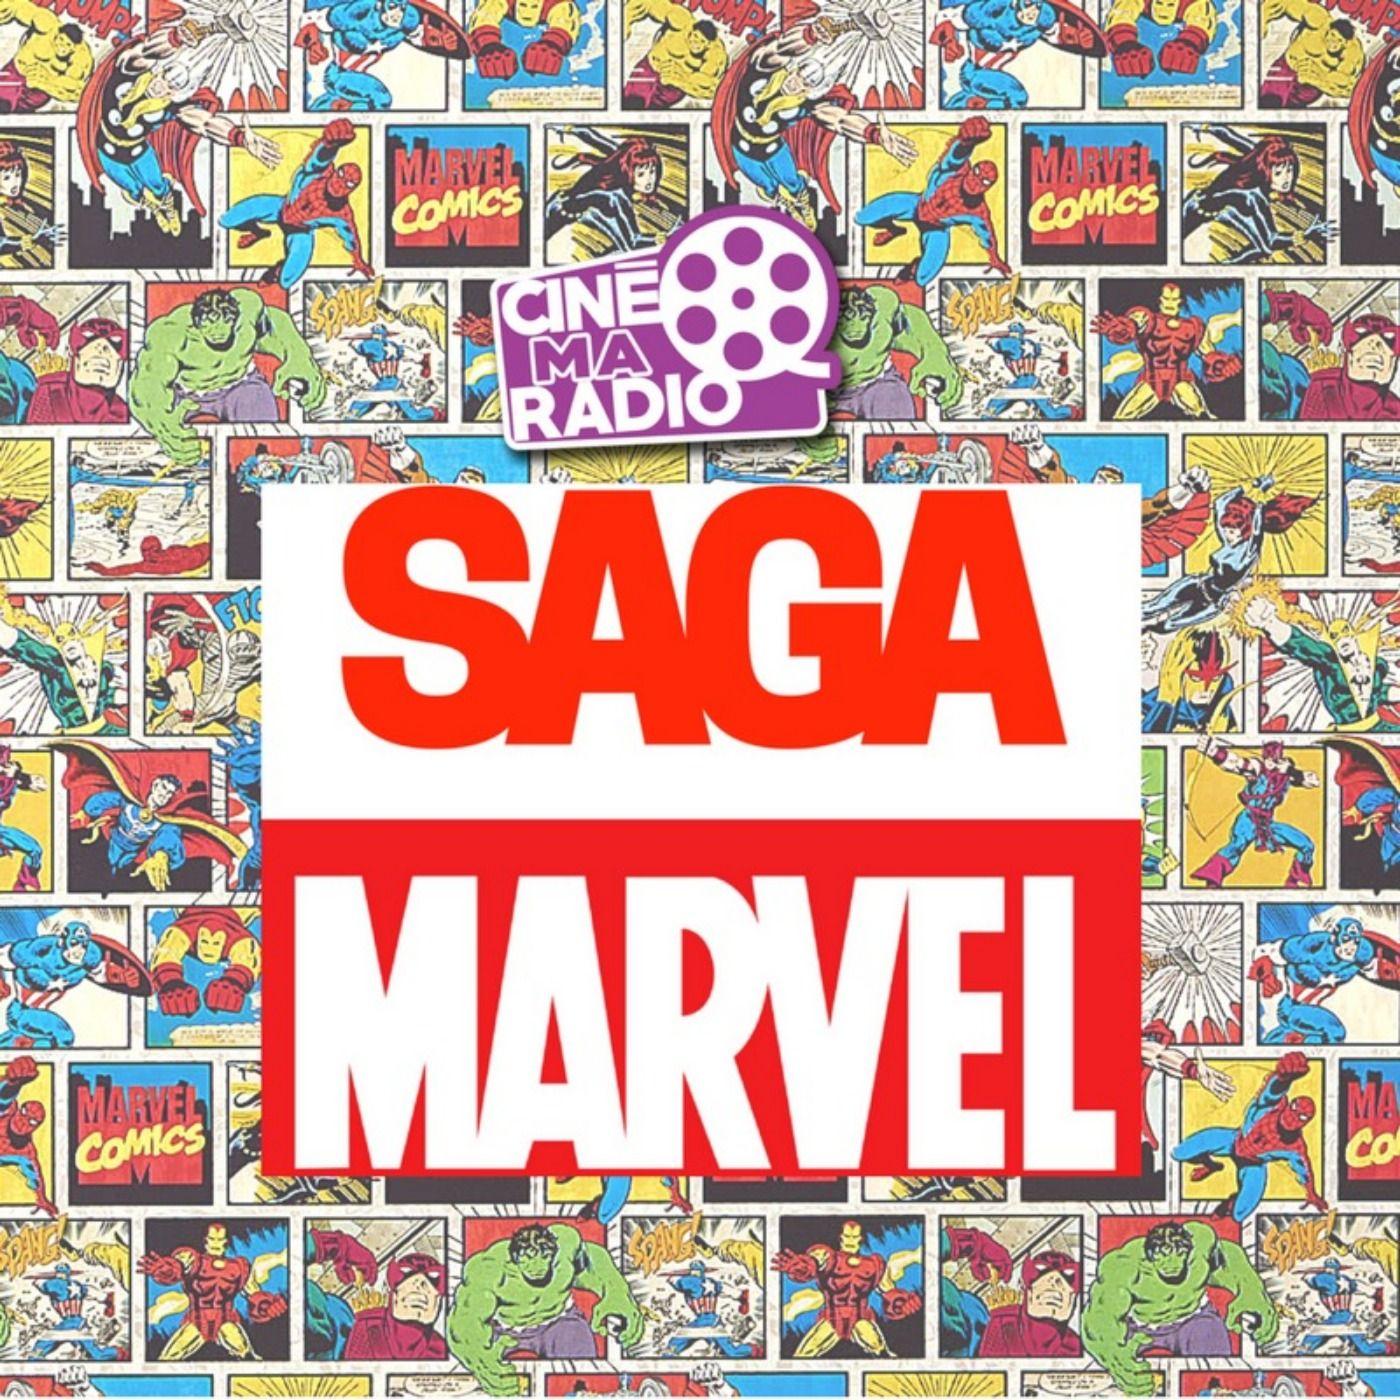 SAGA MARVEL | Avengers 2, l'ère d'Ultron | CinéMaRadio